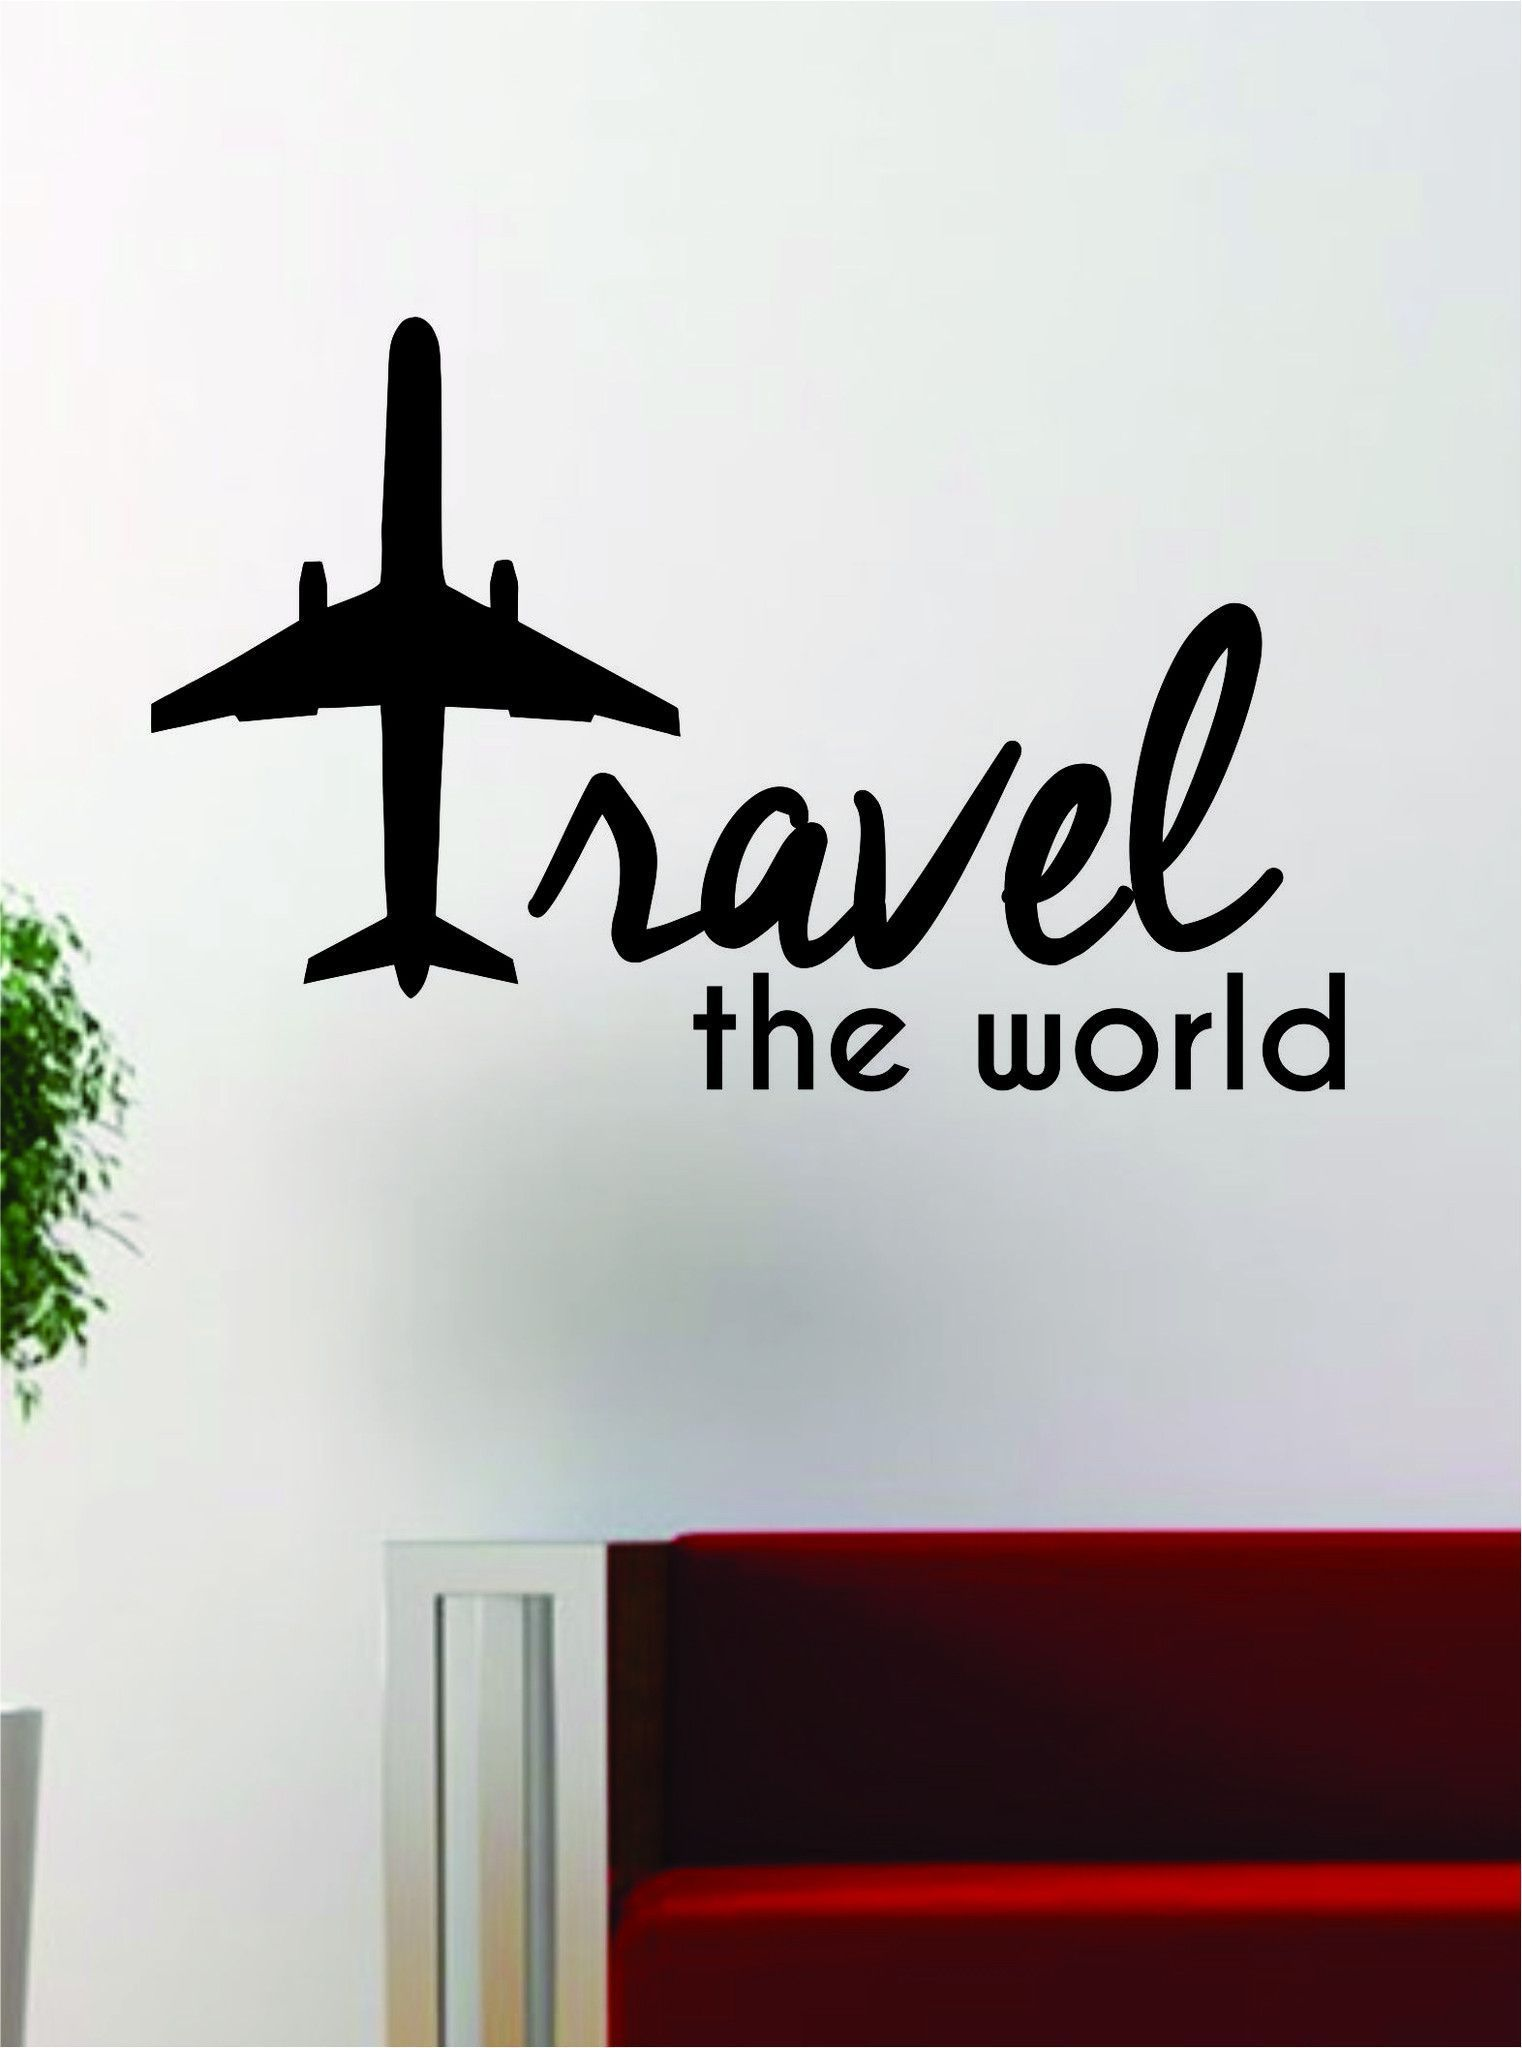 Travel The World Airplane Quote Decal Sticker Wall Vinyl Decor Art Adventure Wall Vinyl Decor Vinyl Decor Airplane Quotes [ 2048 x 1522 Pixel ]